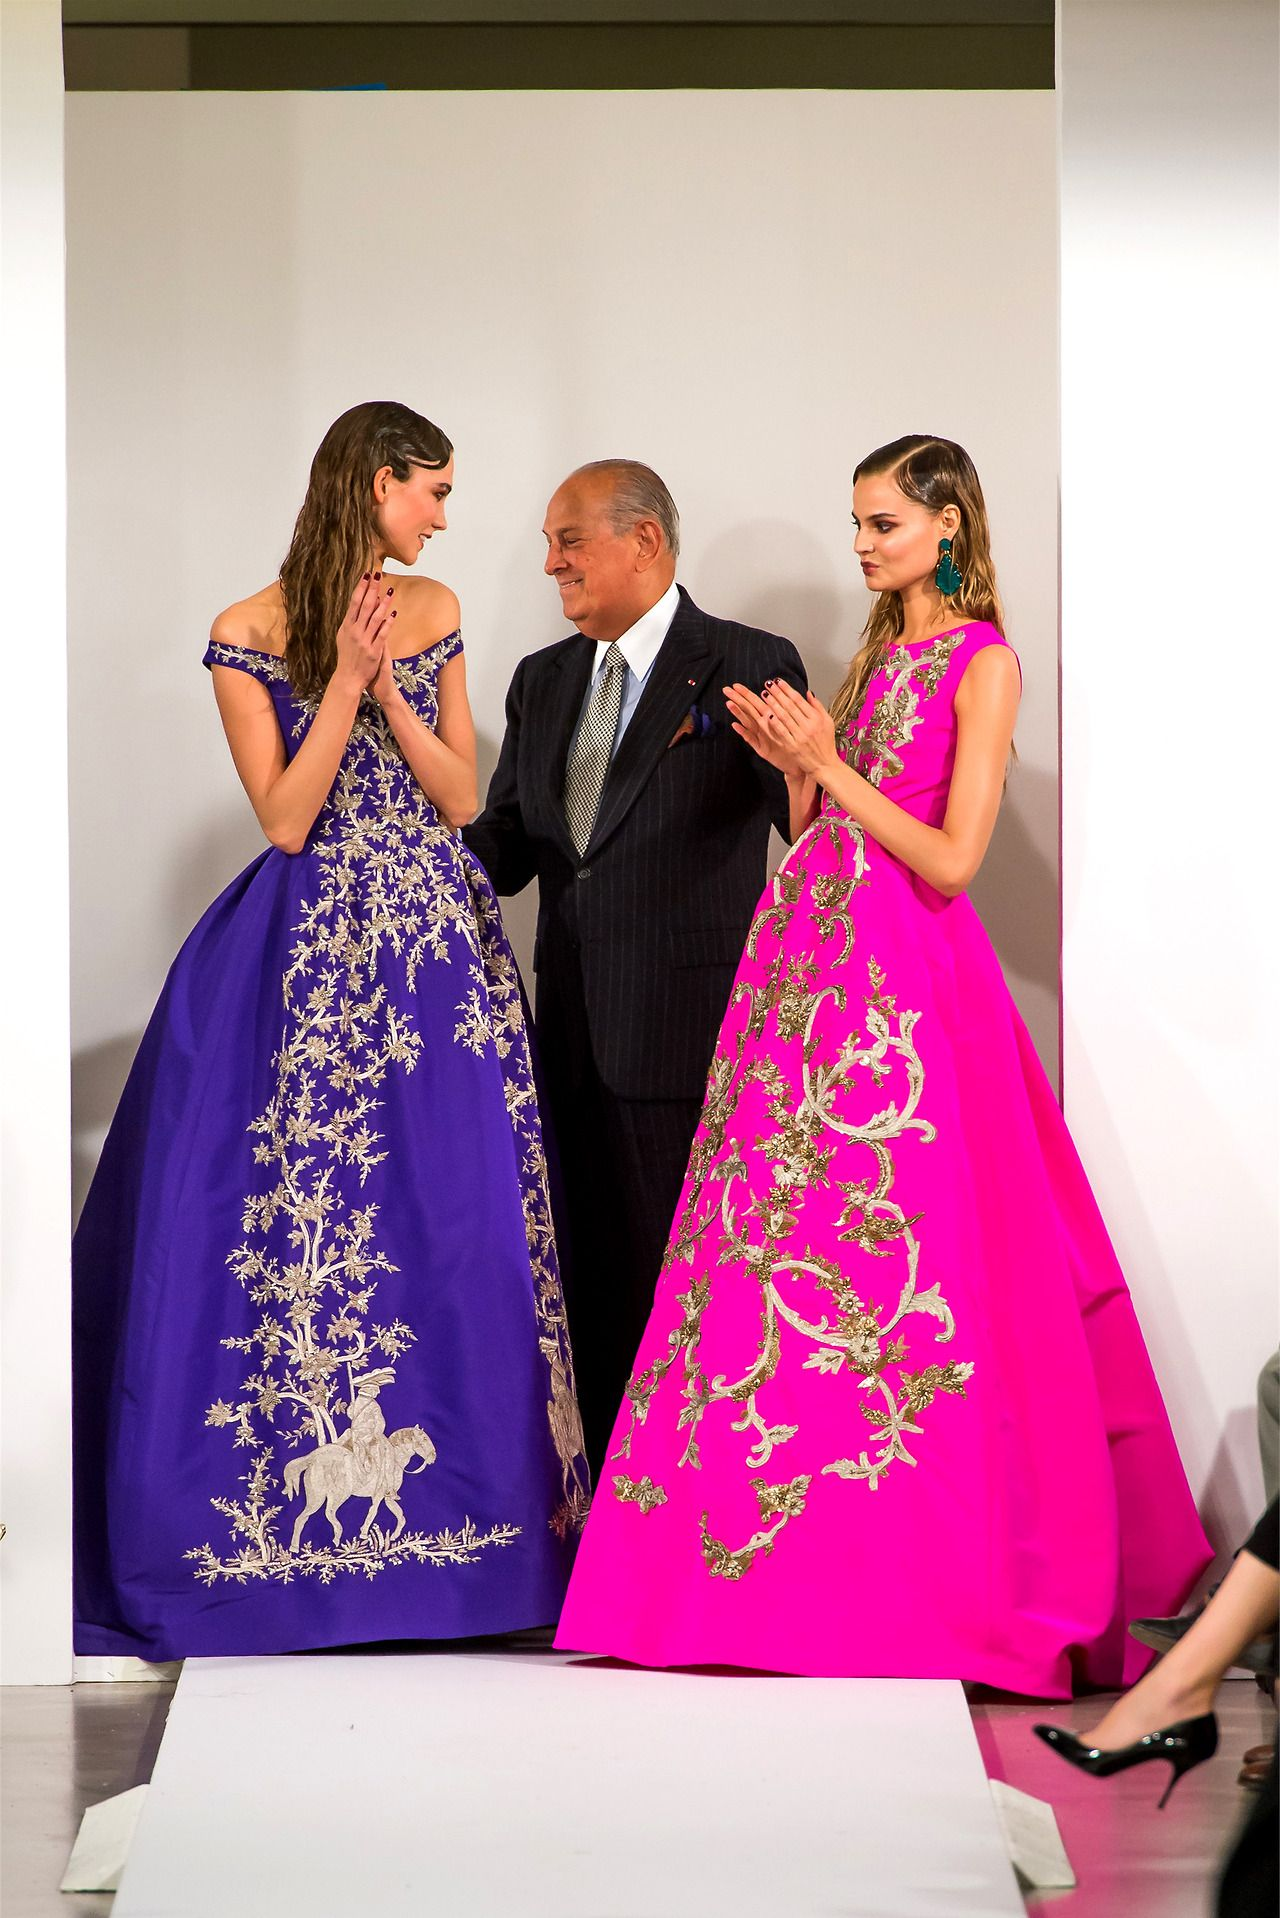 Karlie Kloss, Oscar de la Renta, and Magdalena Frackowiak at the ...